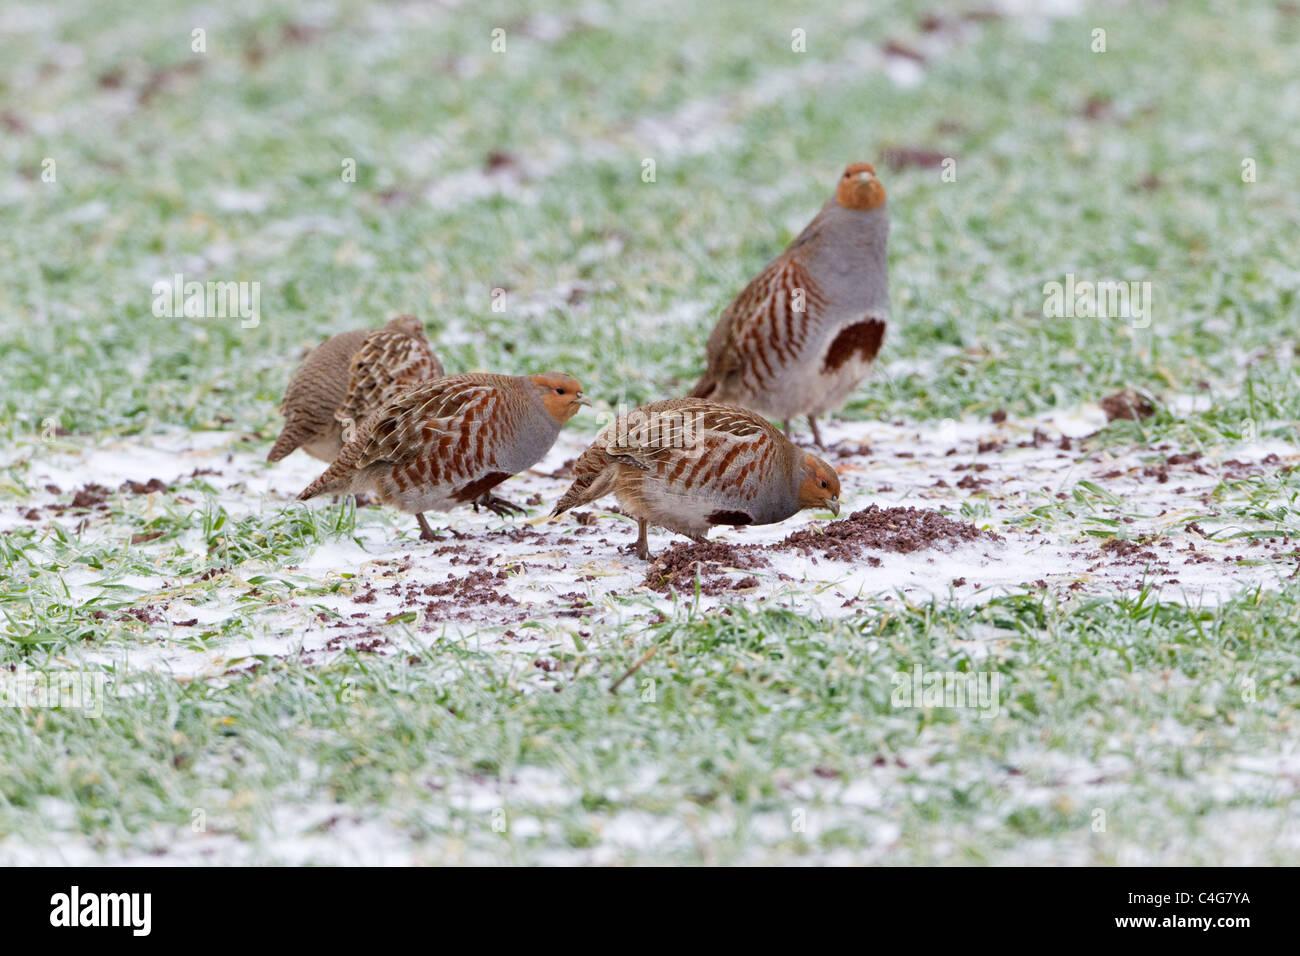 Grey Partridge (Perdix perdix), four birds searching for food on cornfield in winter, Lower Saxony, Germany - Stock Image